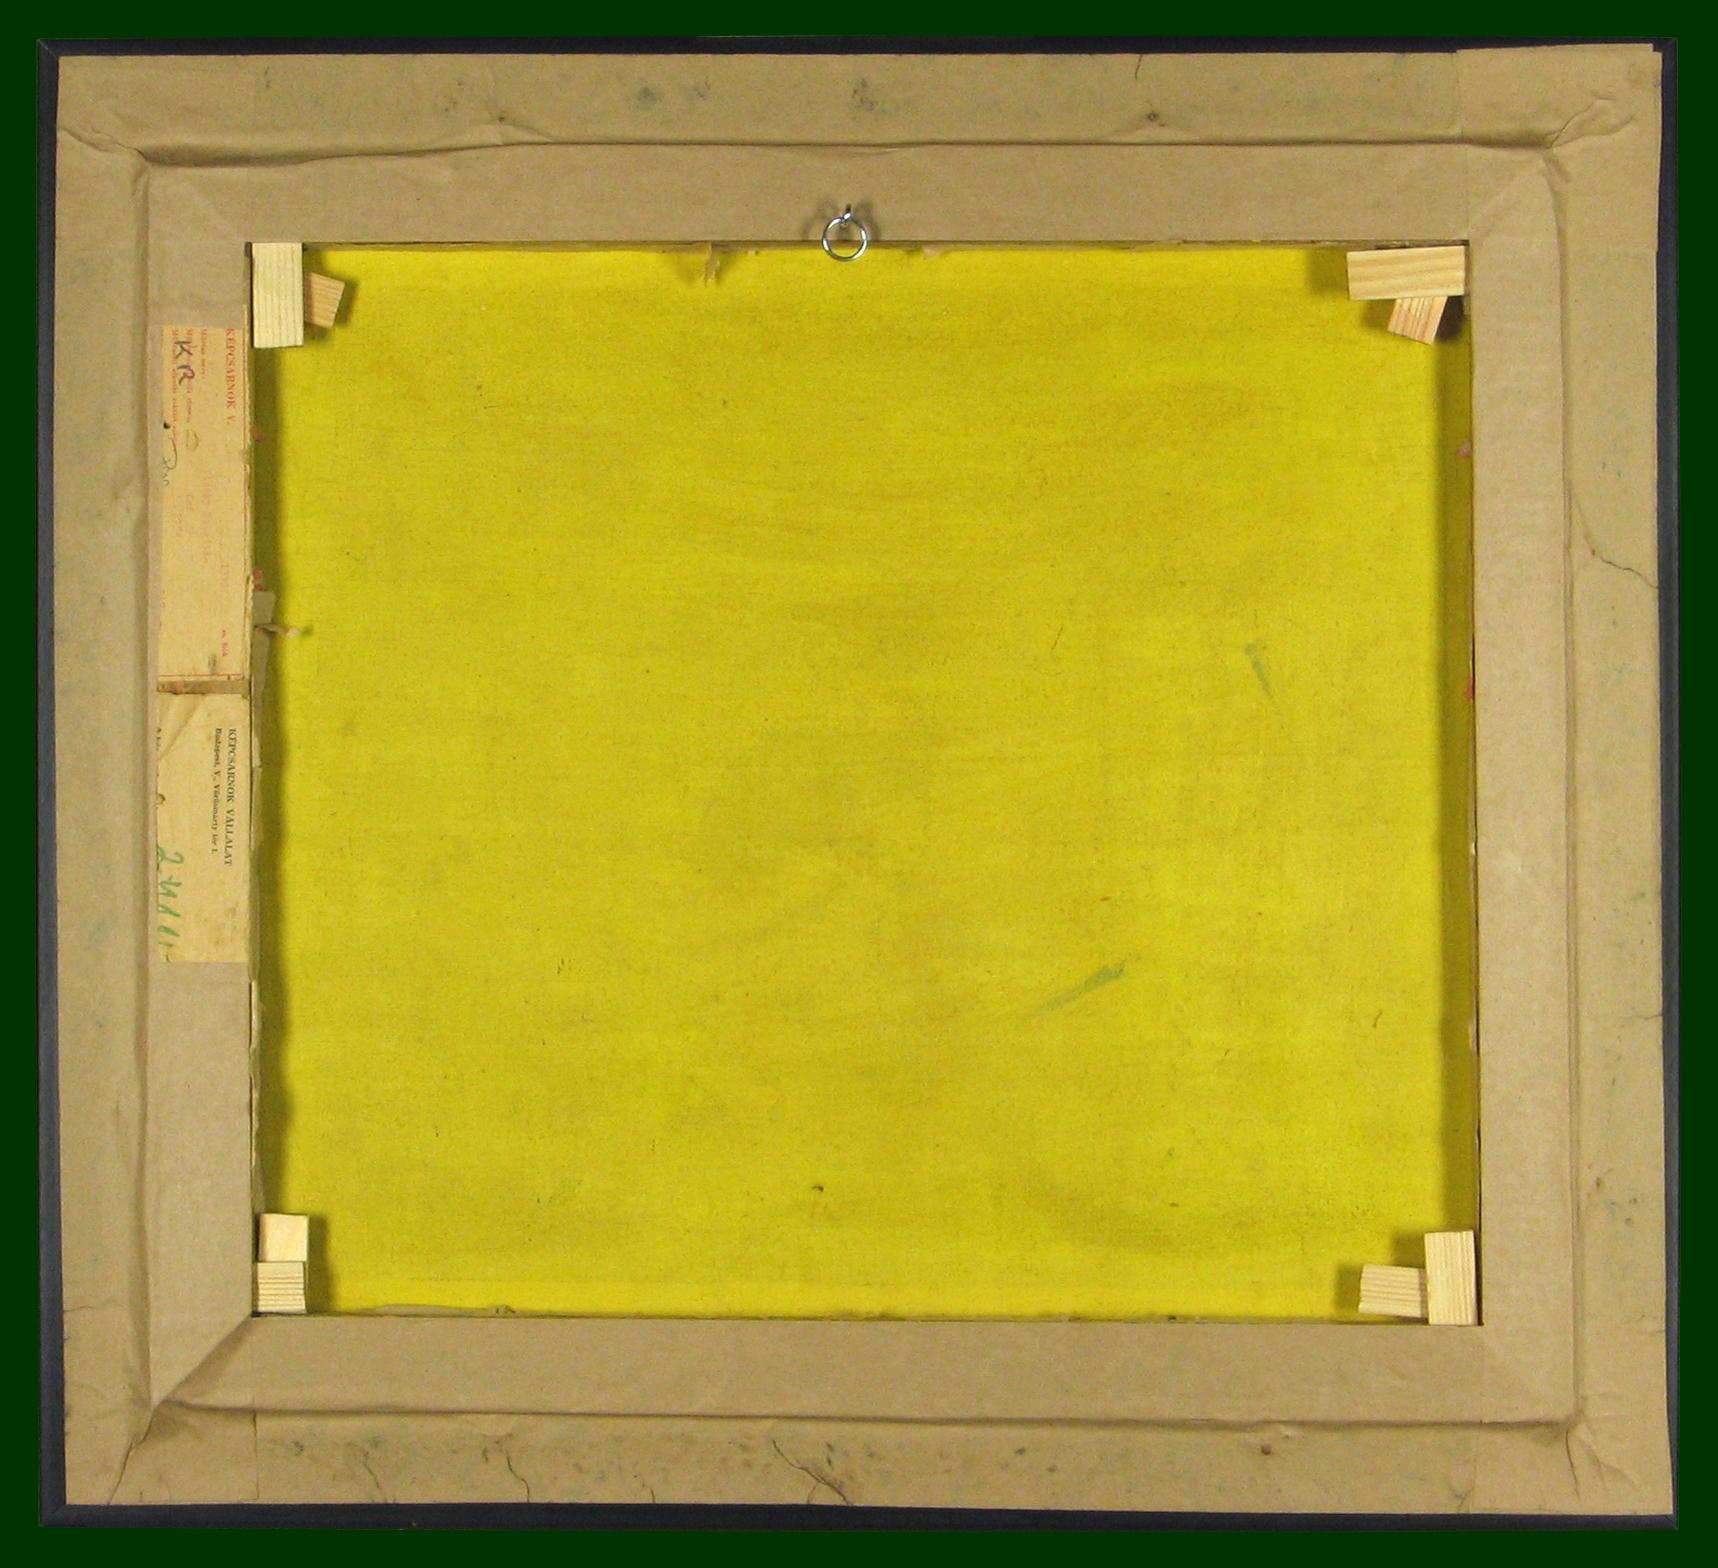 44-12h_t.jpg (1718�1568)